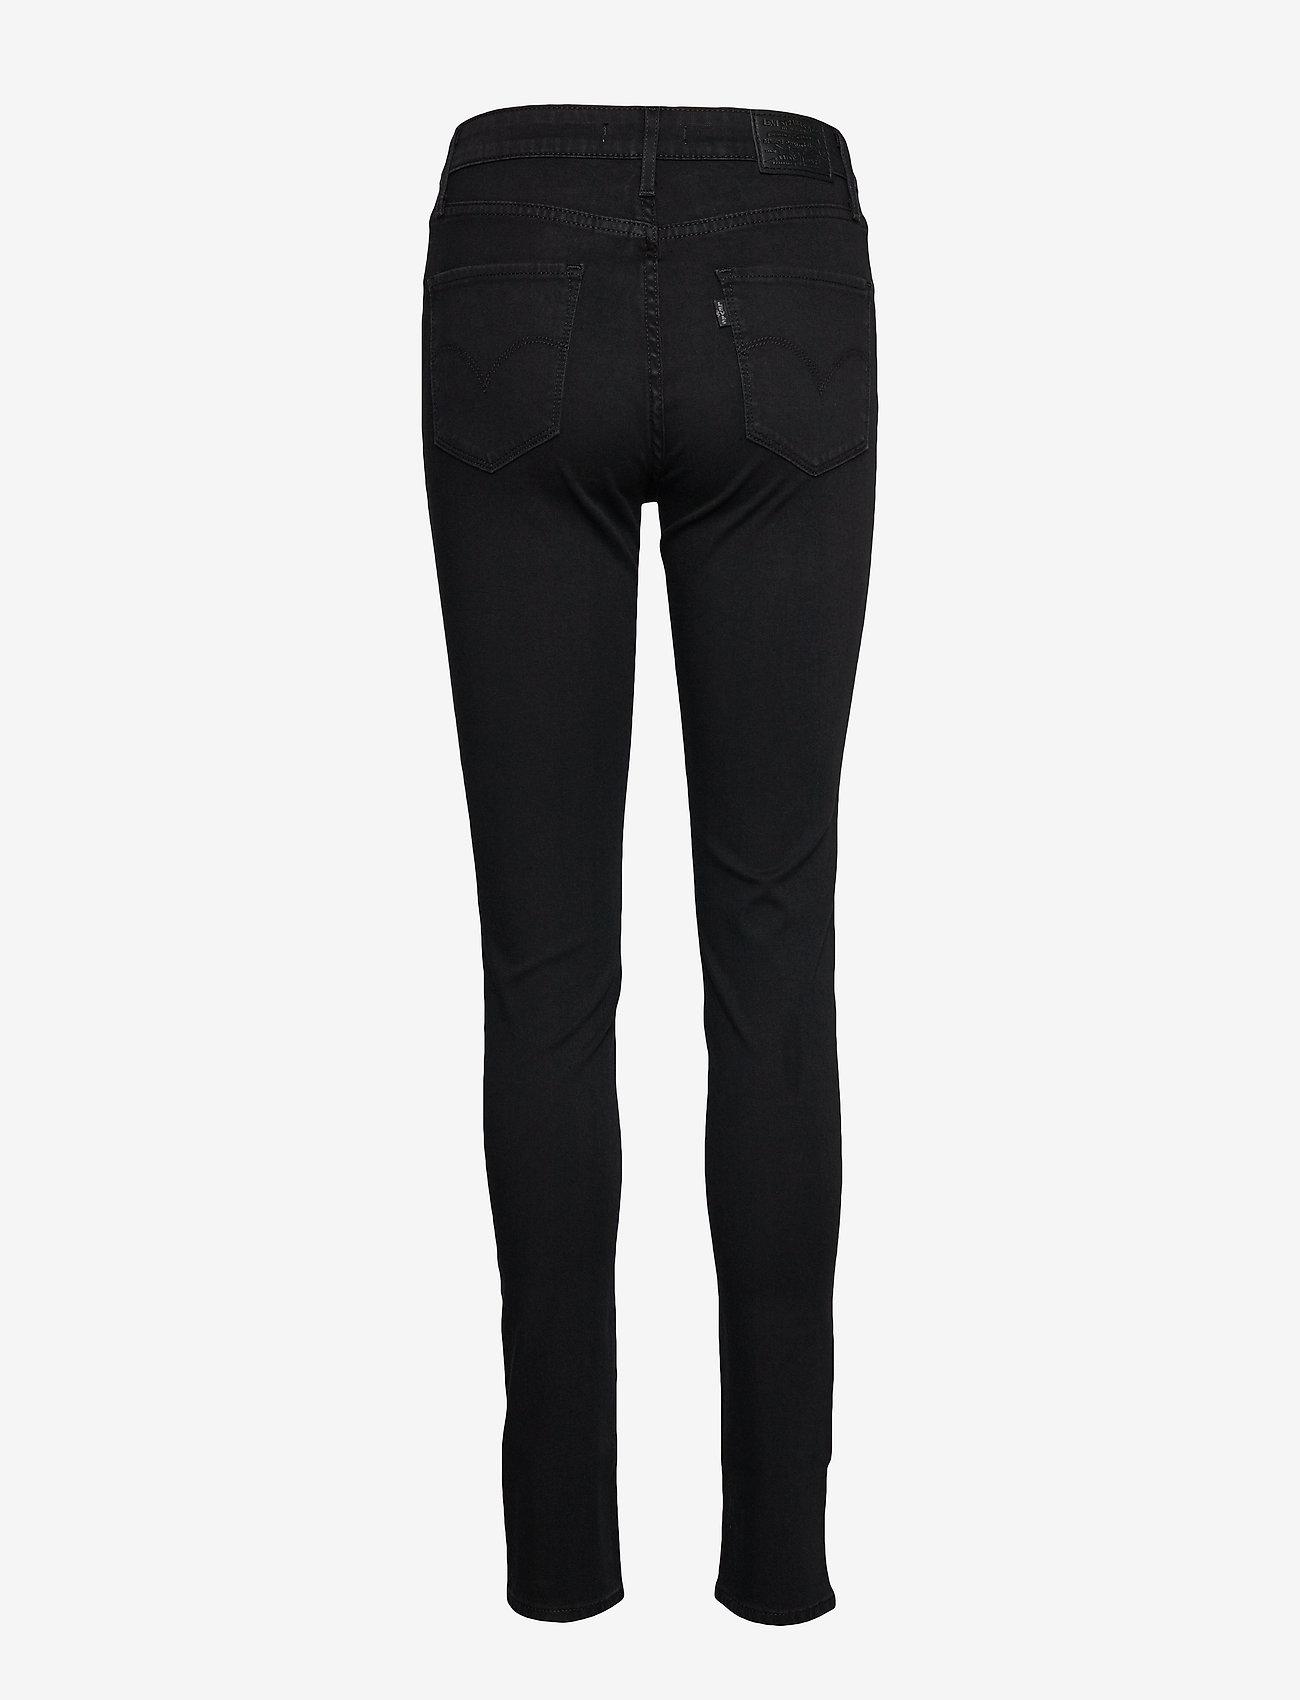 LEVI´S Women - 721 HIGH RISE SKINNY LONG SHOT - skinny jeans - blacks - 1